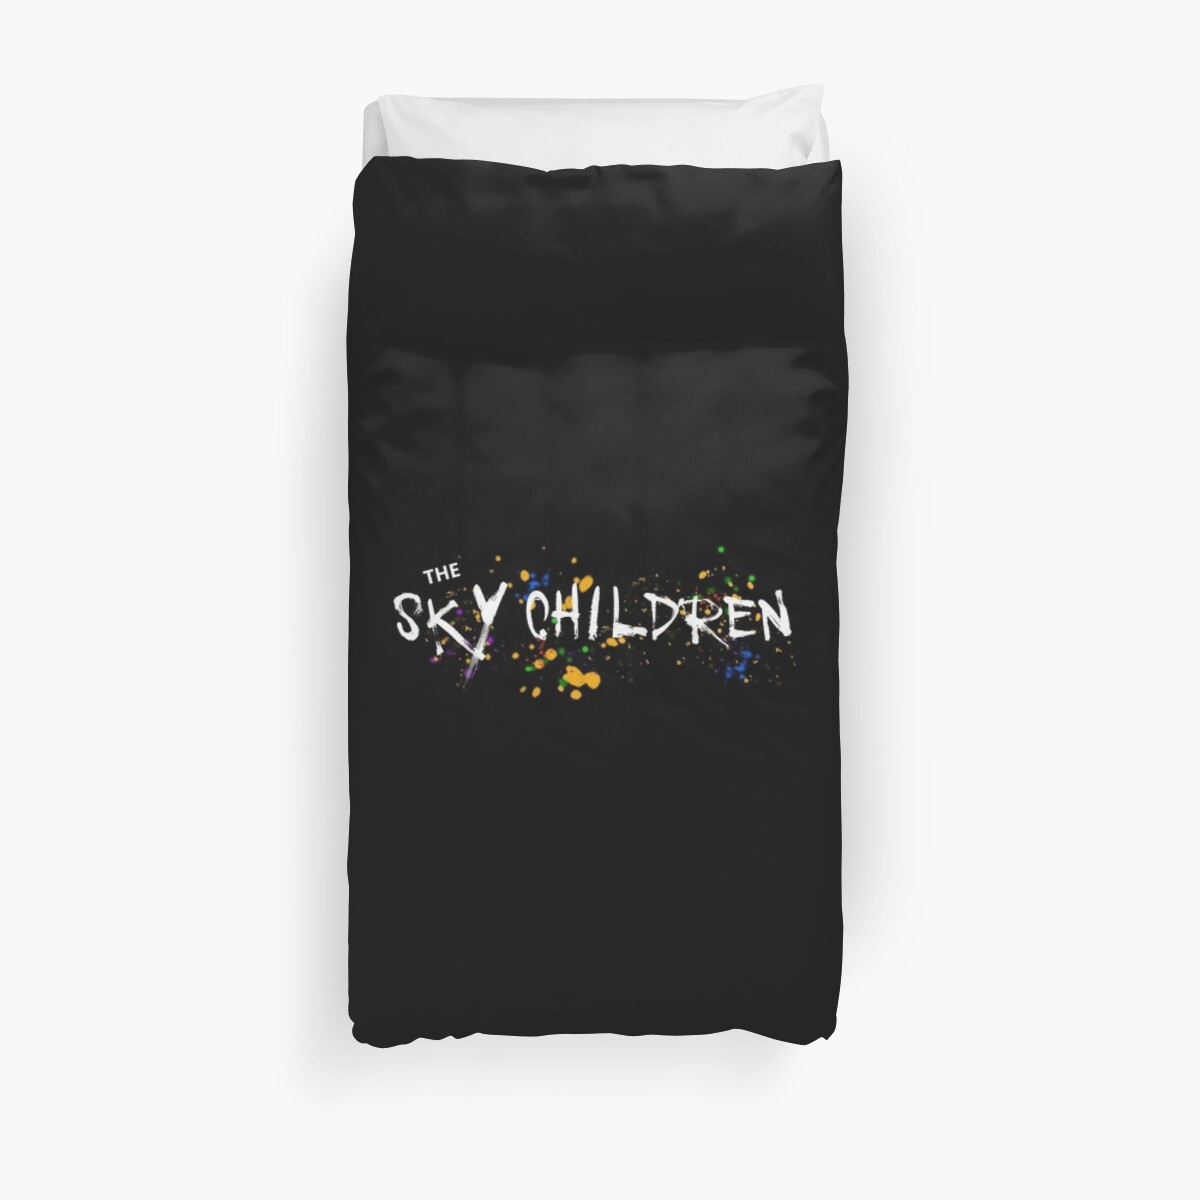 The Sky Children